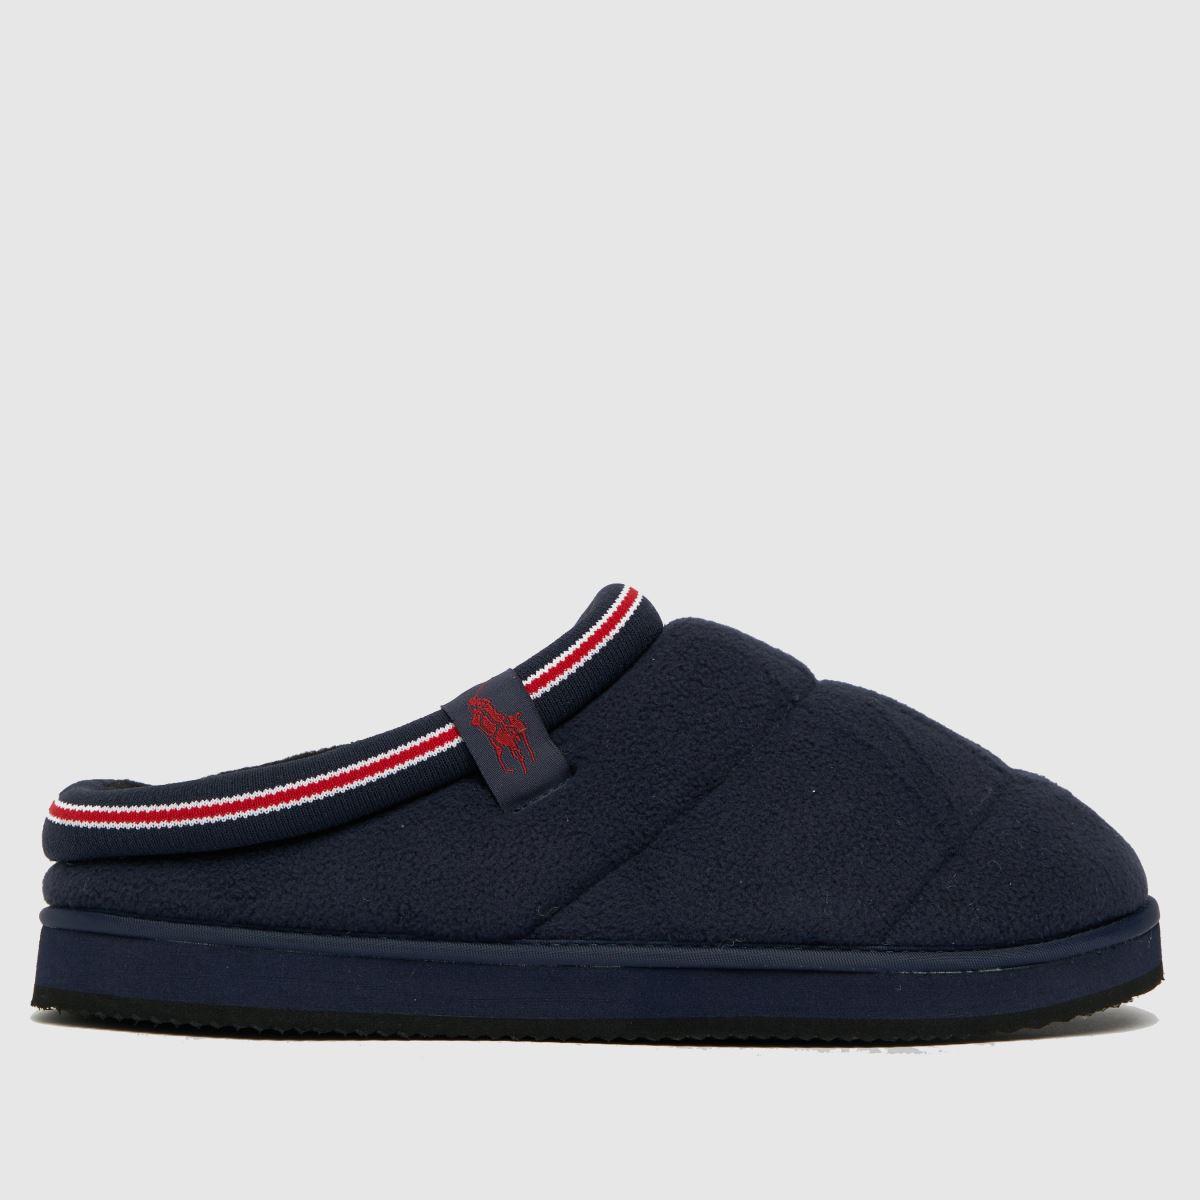 Polo Ralph Lauren Navy Rl Sutton Slippers